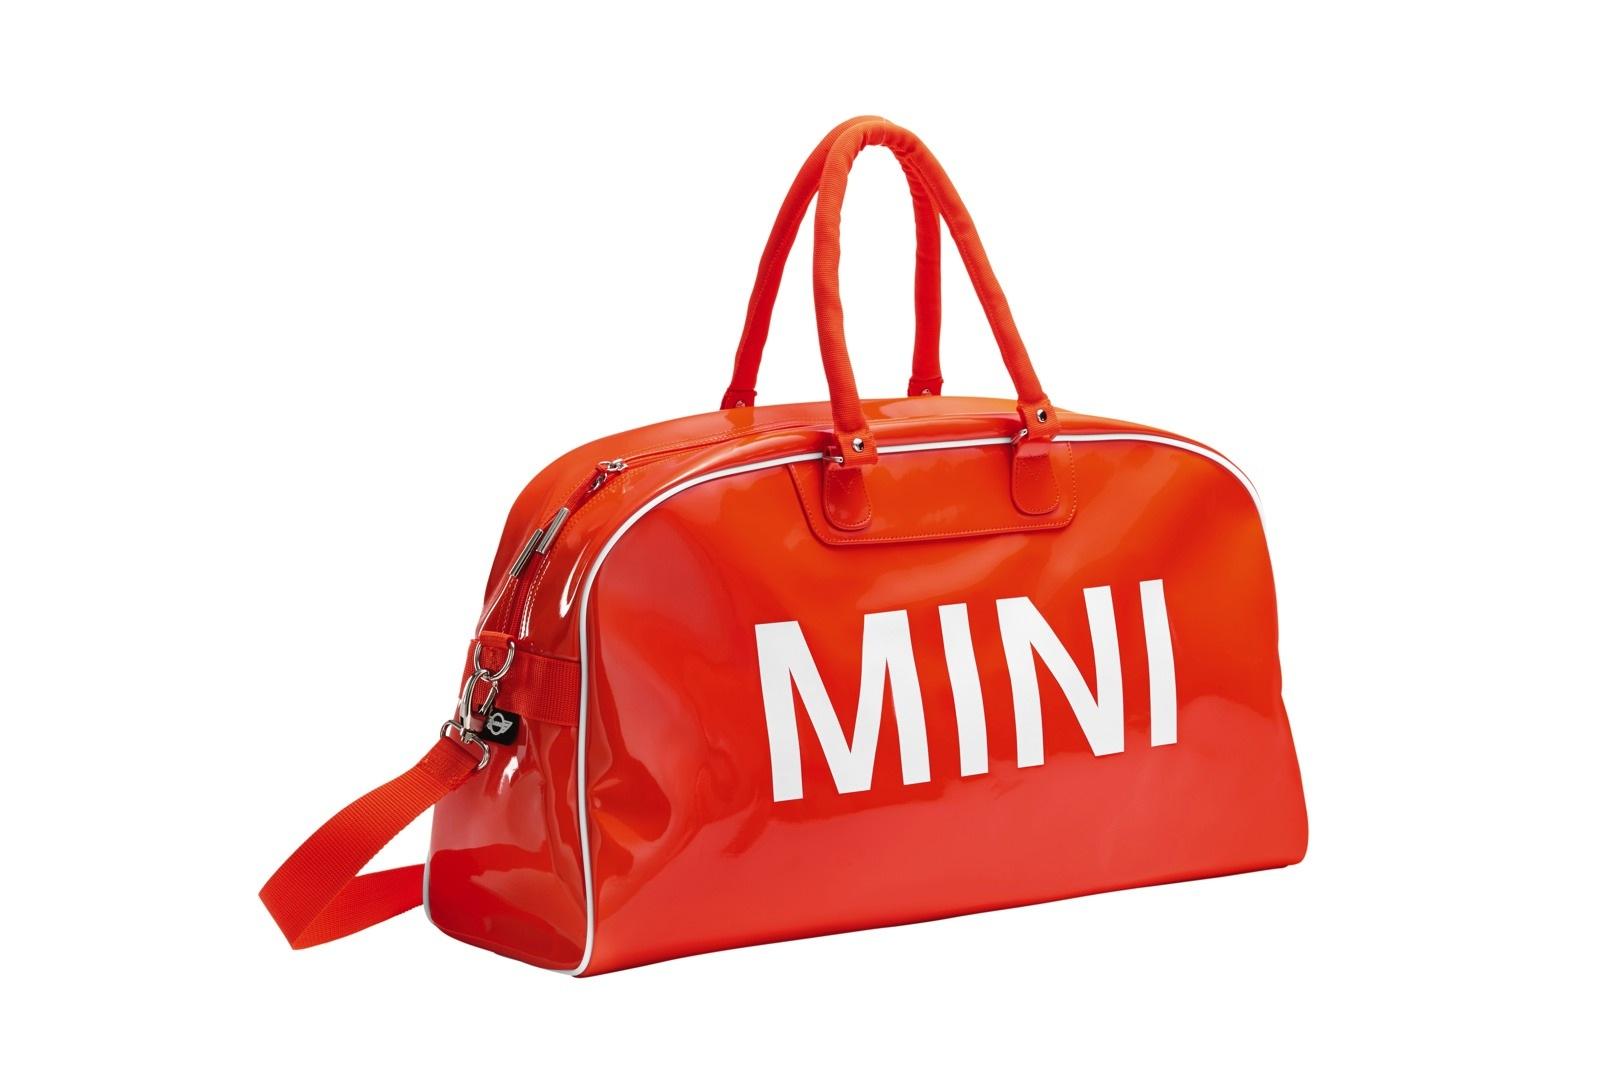 a429e9d4ae MINI Launches New Luggage Collection with Puma - autoevolution